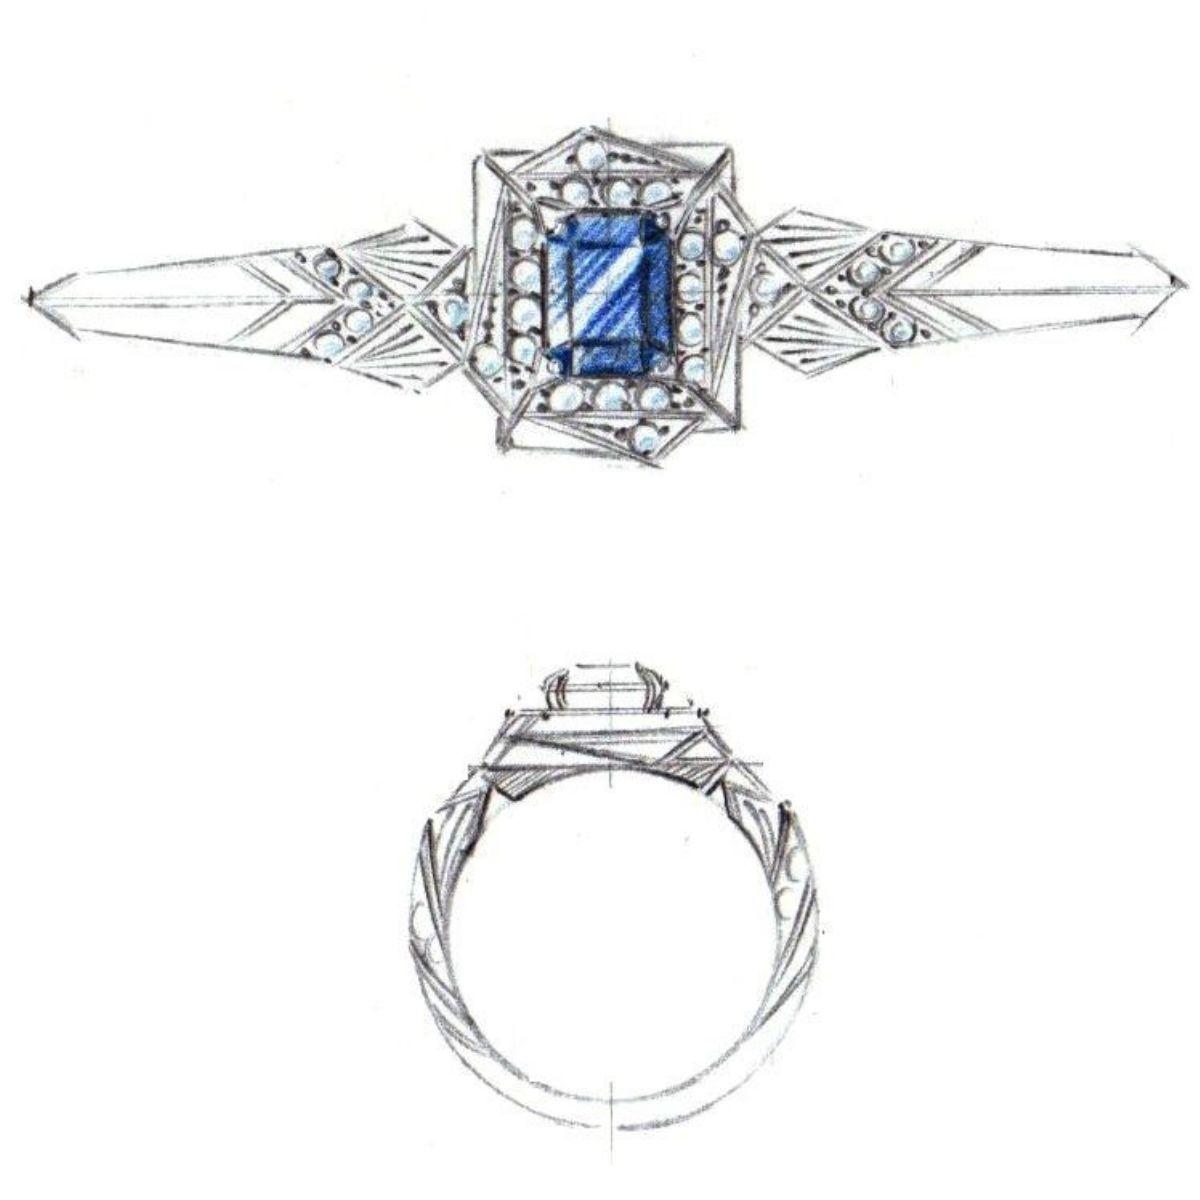 6d539fa88acb5 Art Deco Engagement Rings | CustomMade.com